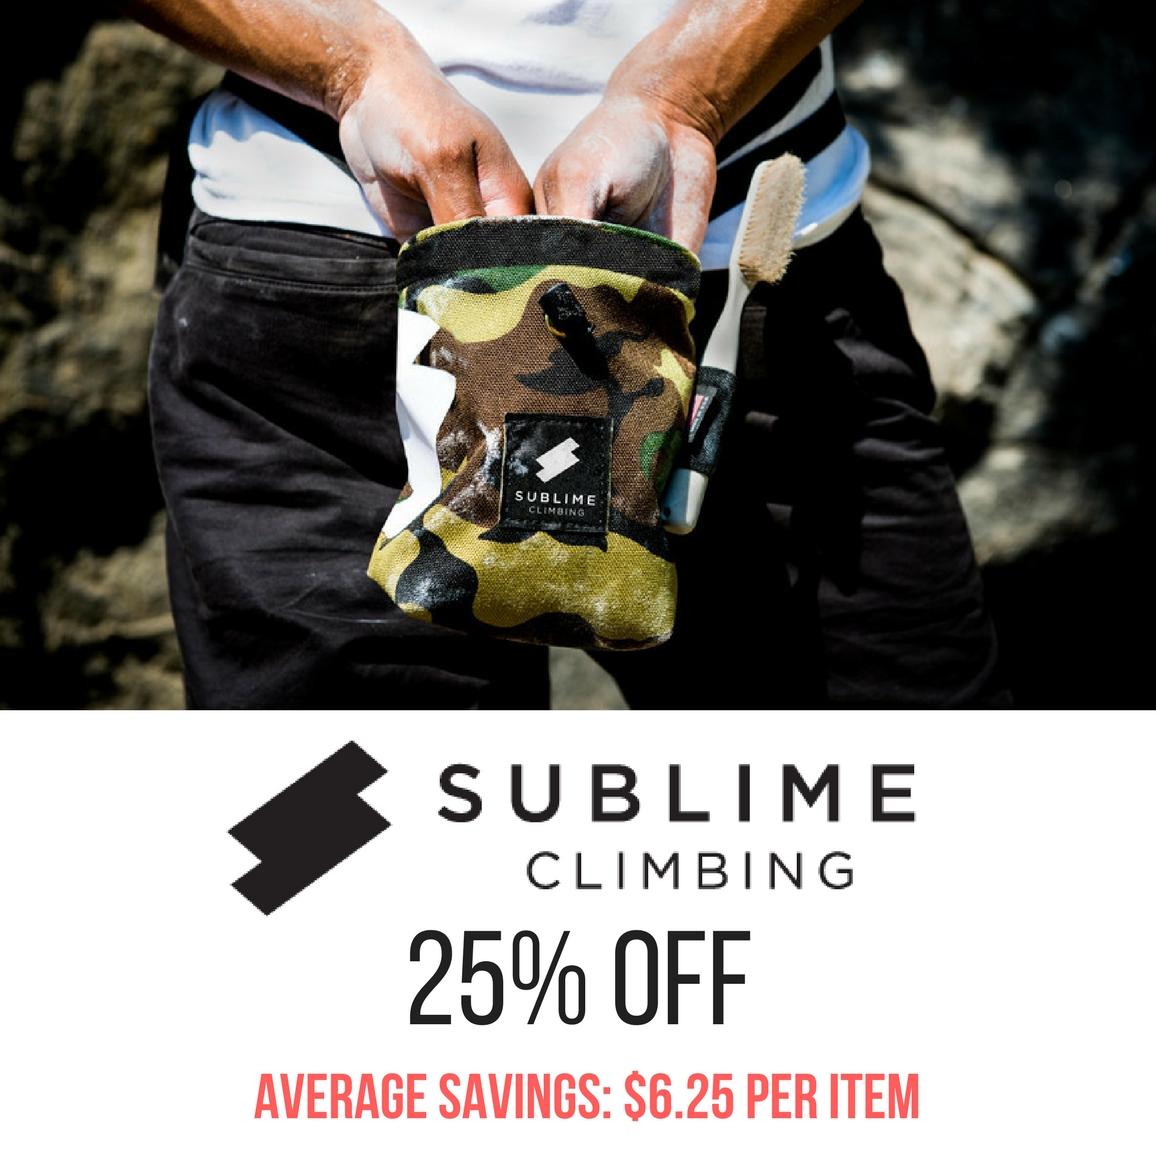 Sublime Climbing Membership Sample Product image.jpg